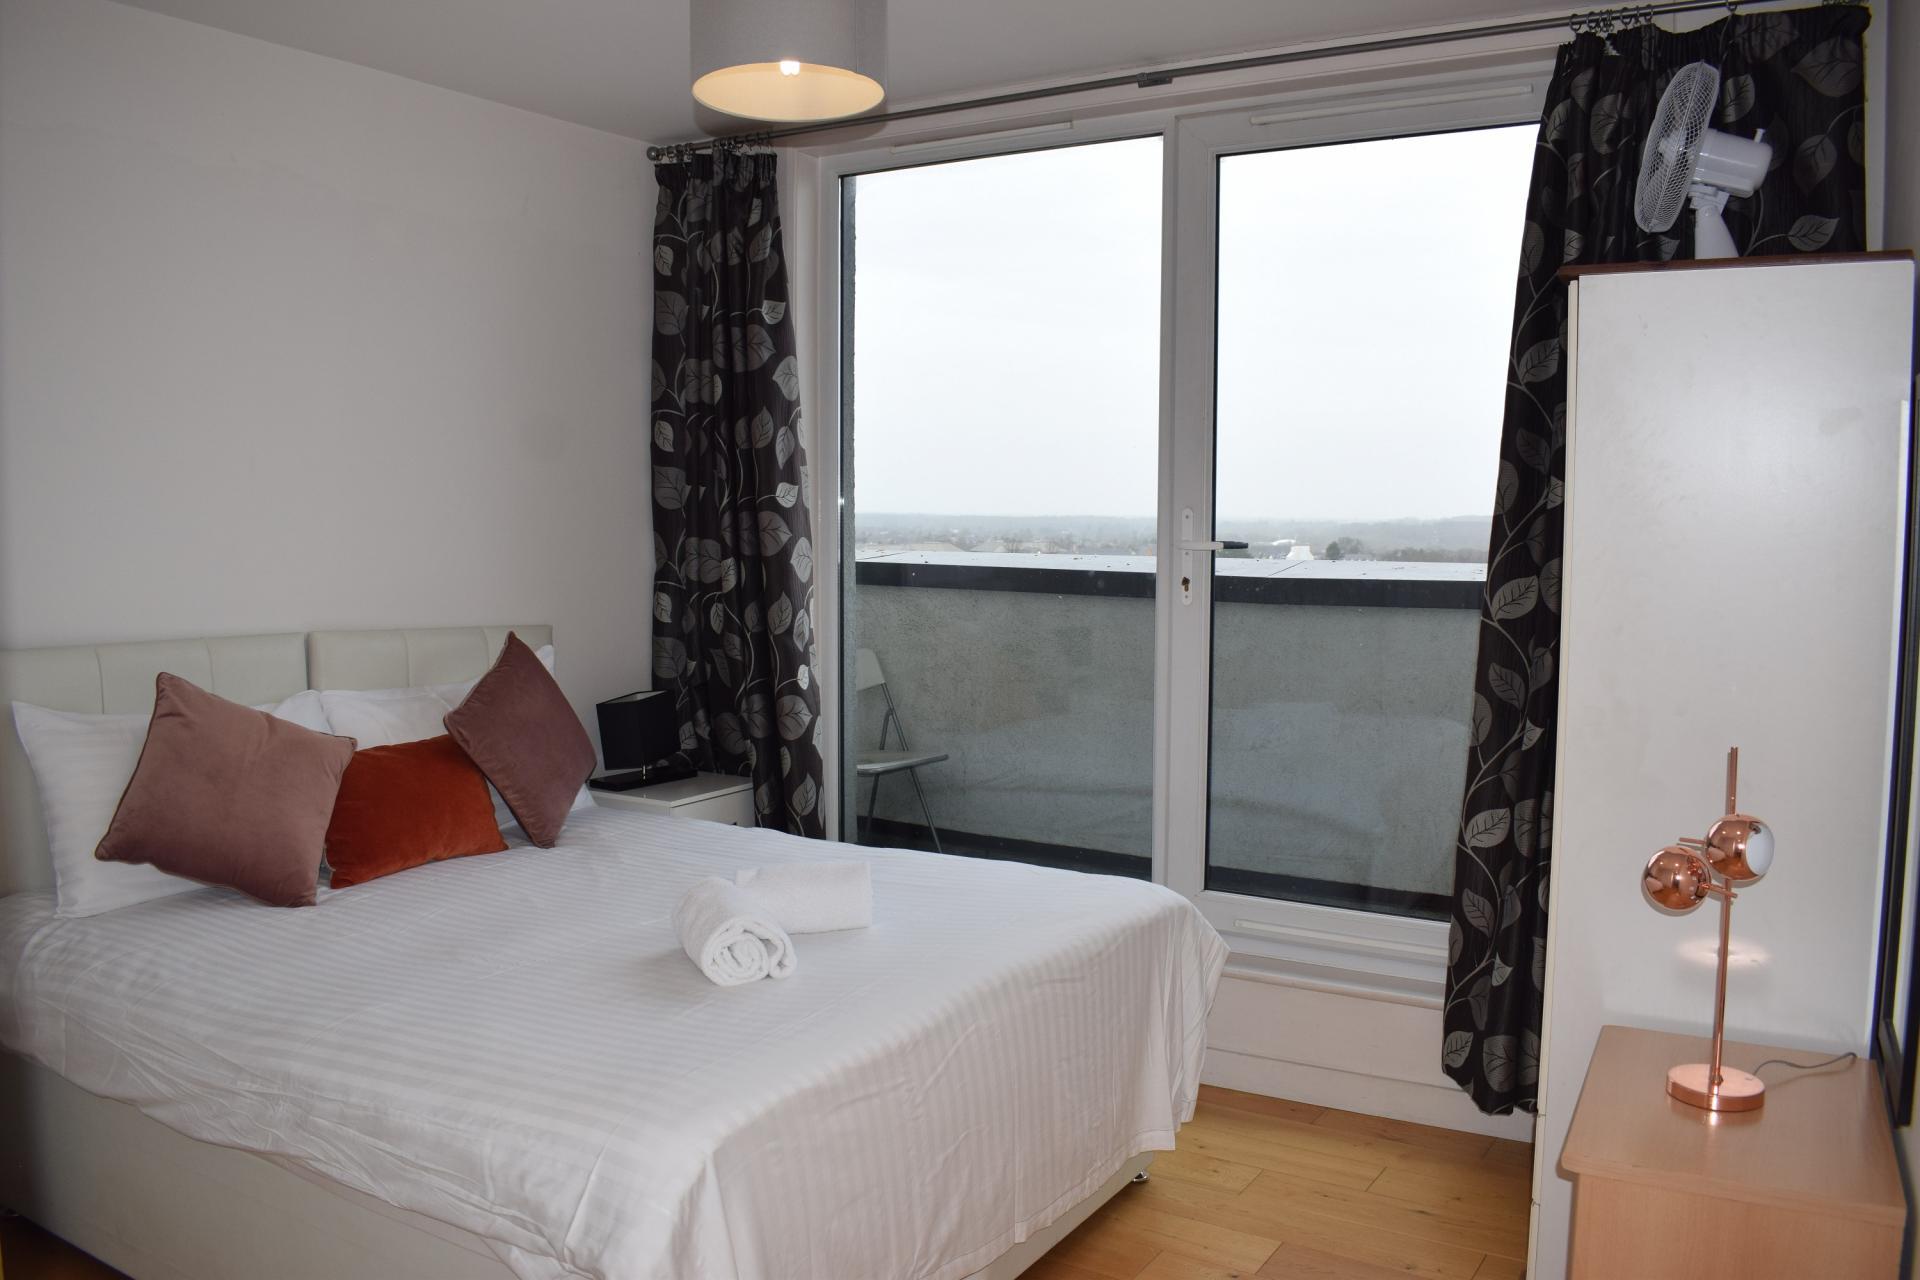 Sleep at Clarendon Loft Apartments, Centre, Watford